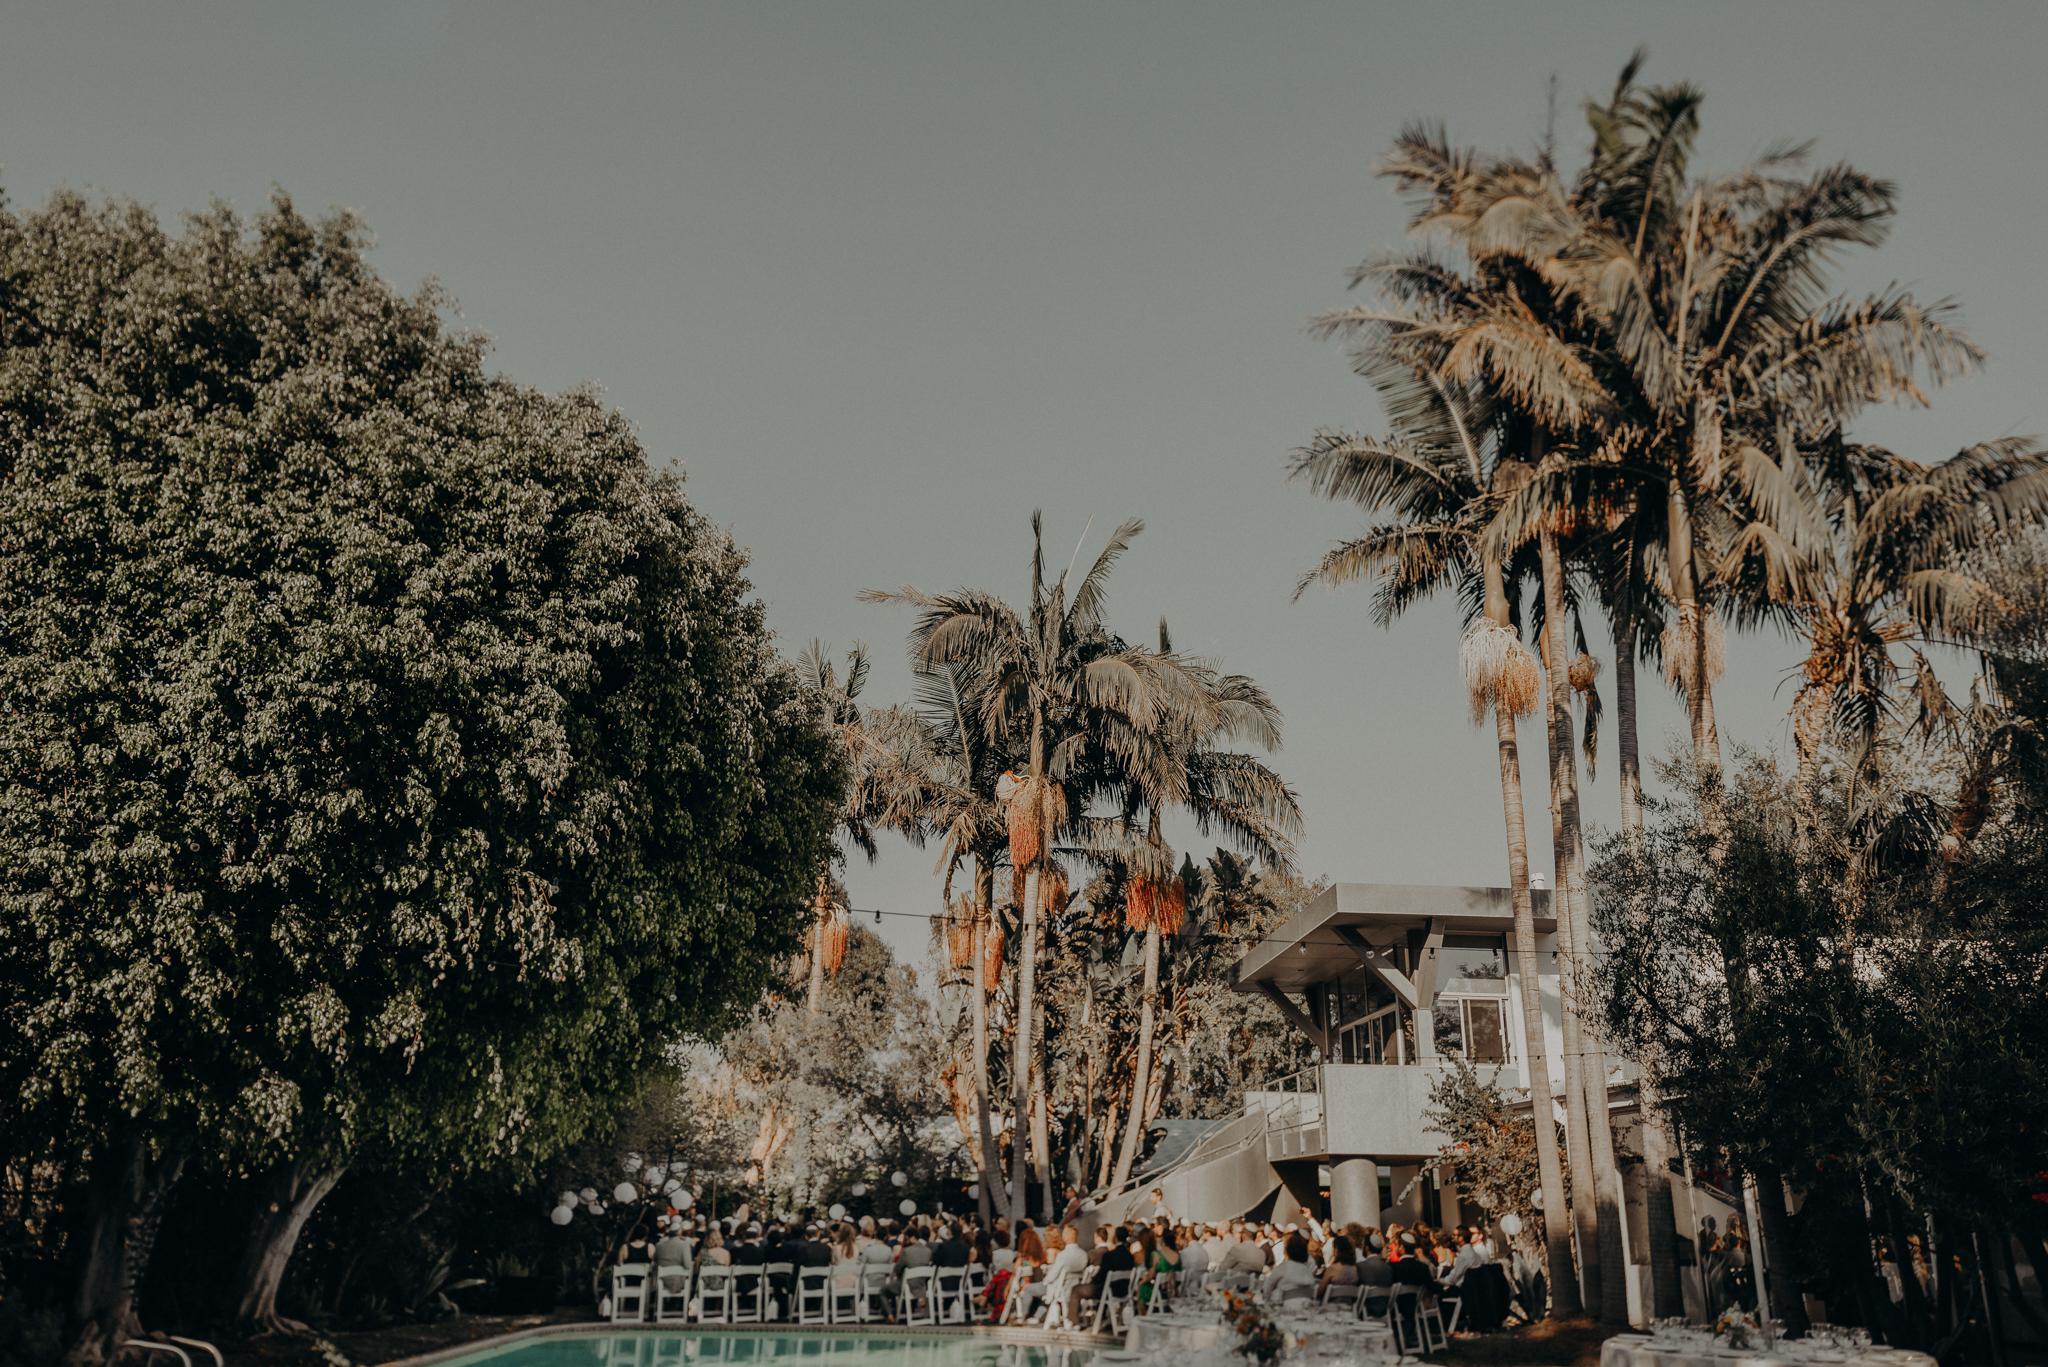 Isaiah + Taylor Photography - Private Estate Backyard Wedding - Beverly Hills - Los Angeles Wedding Photographer - 78.jpg